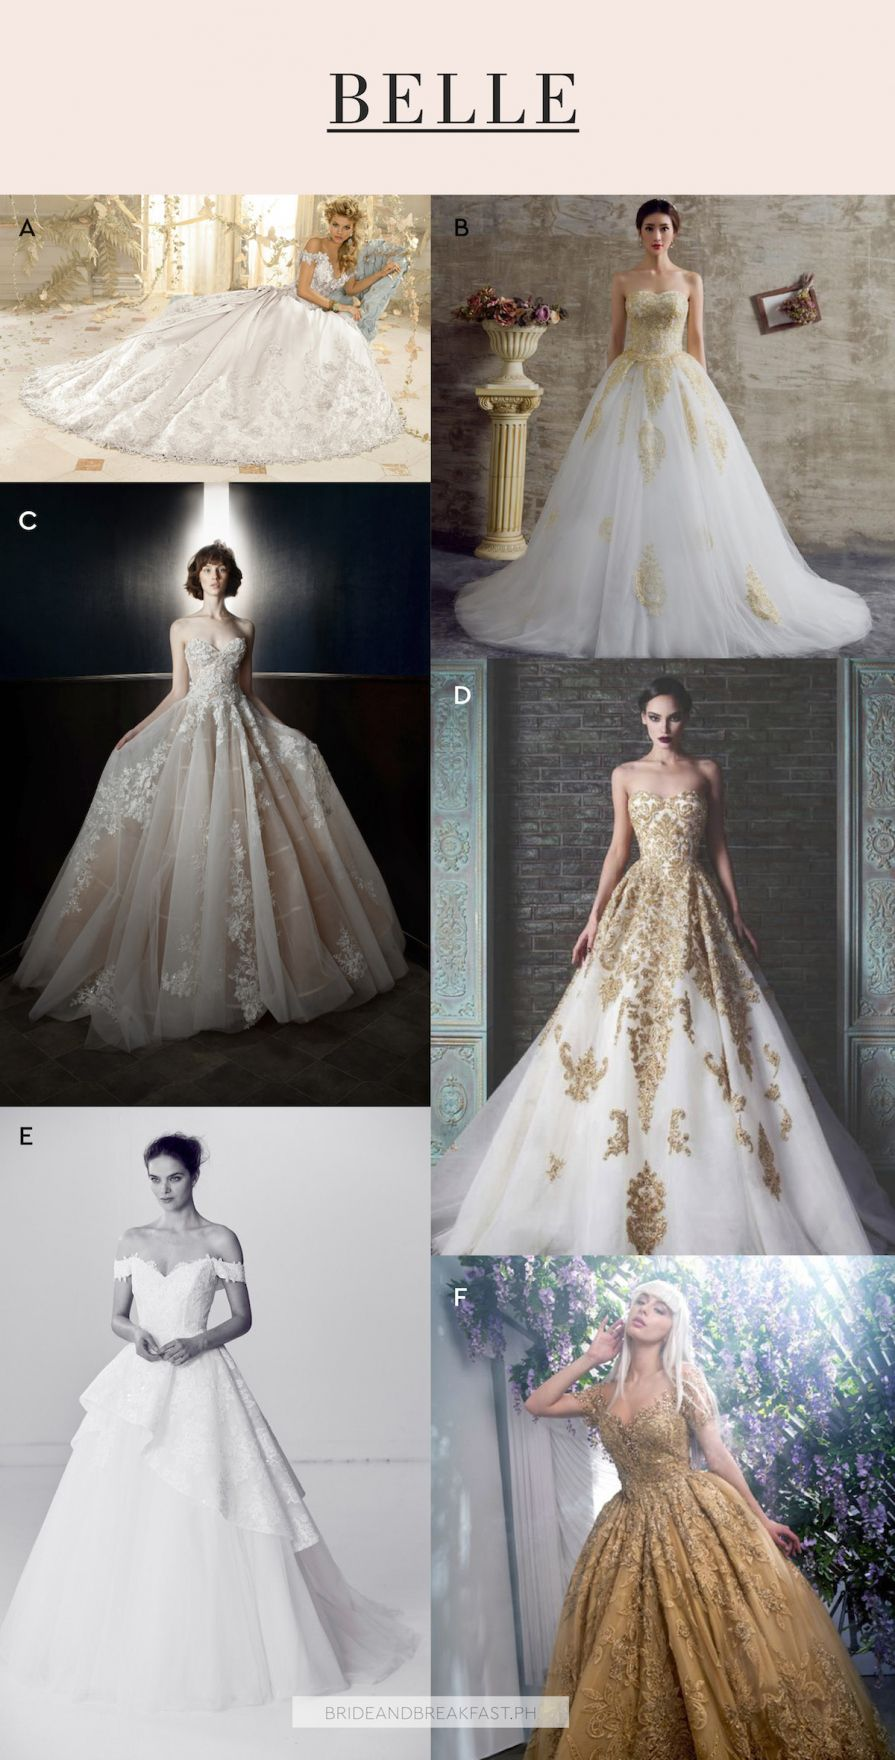 100 Wedding Dresses Inspired By Disney Princesses Wedding Dresses Fo Disney Wedding Dresses Disney Inspired Wedding Dresses Disney Princess Inspired Dresses